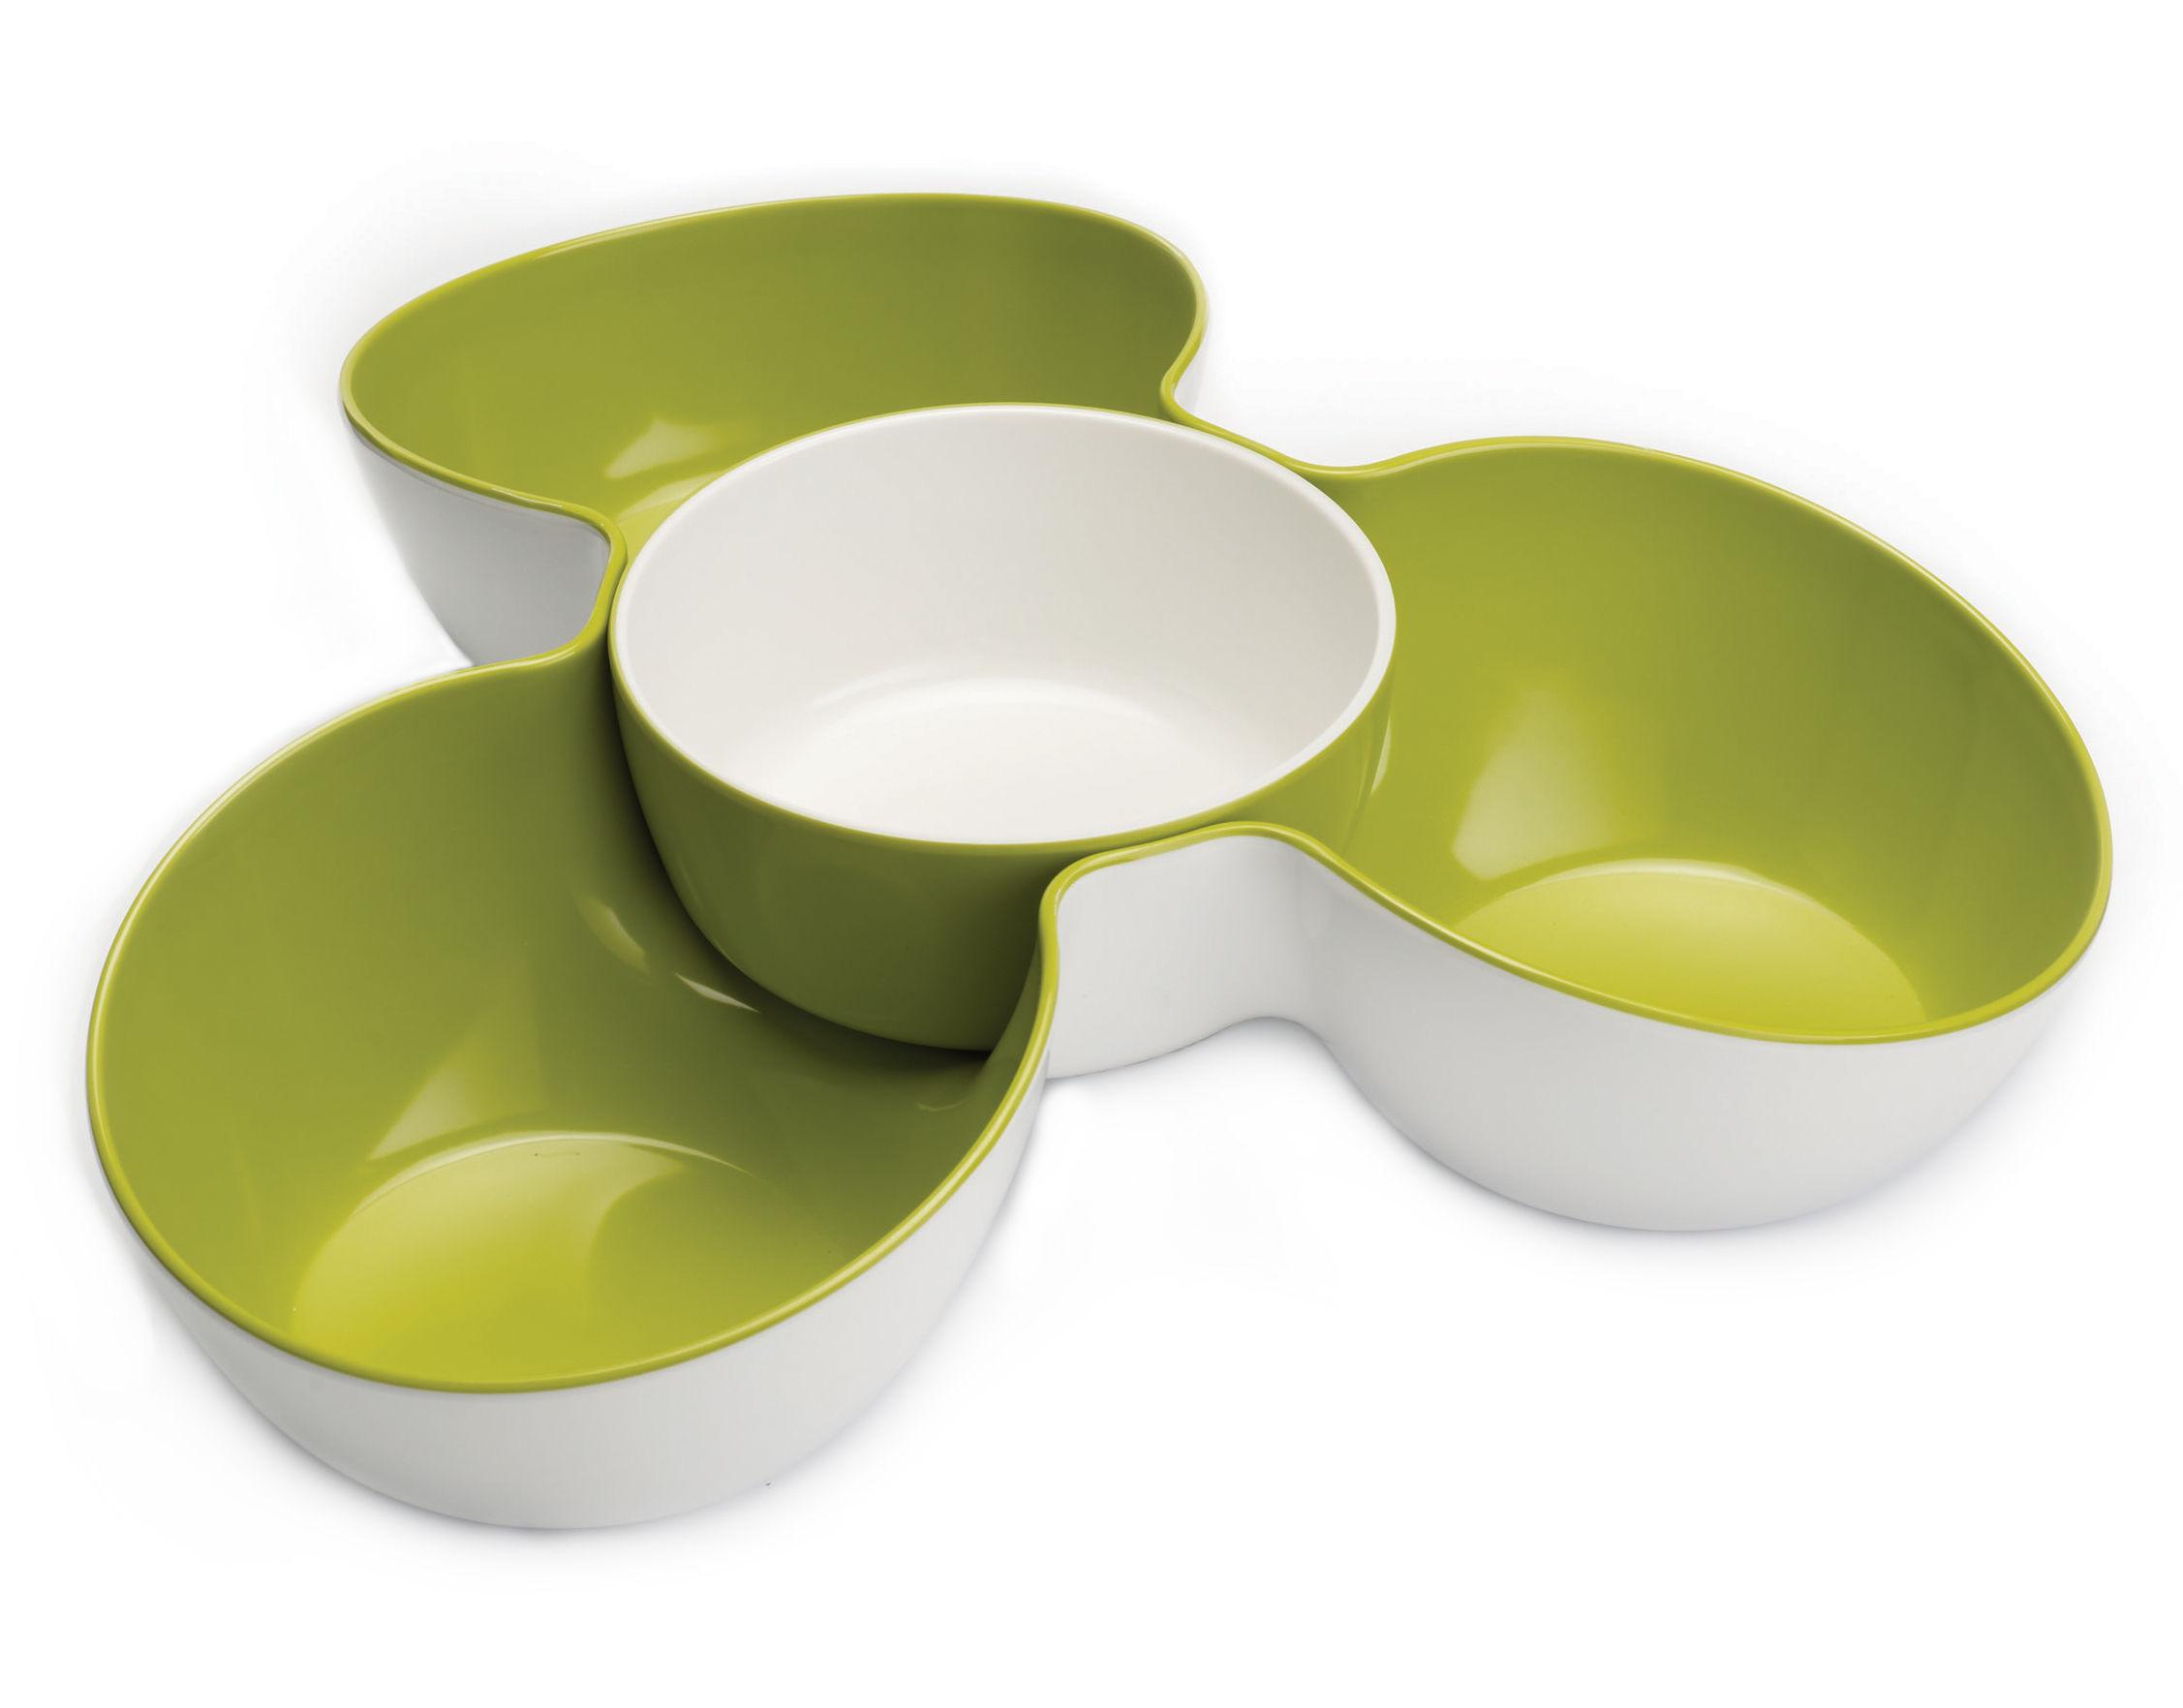 set ap ritif triple dish plat 3 compartiments bol amovible vert blanc joseph joseph. Black Bedroom Furniture Sets. Home Design Ideas